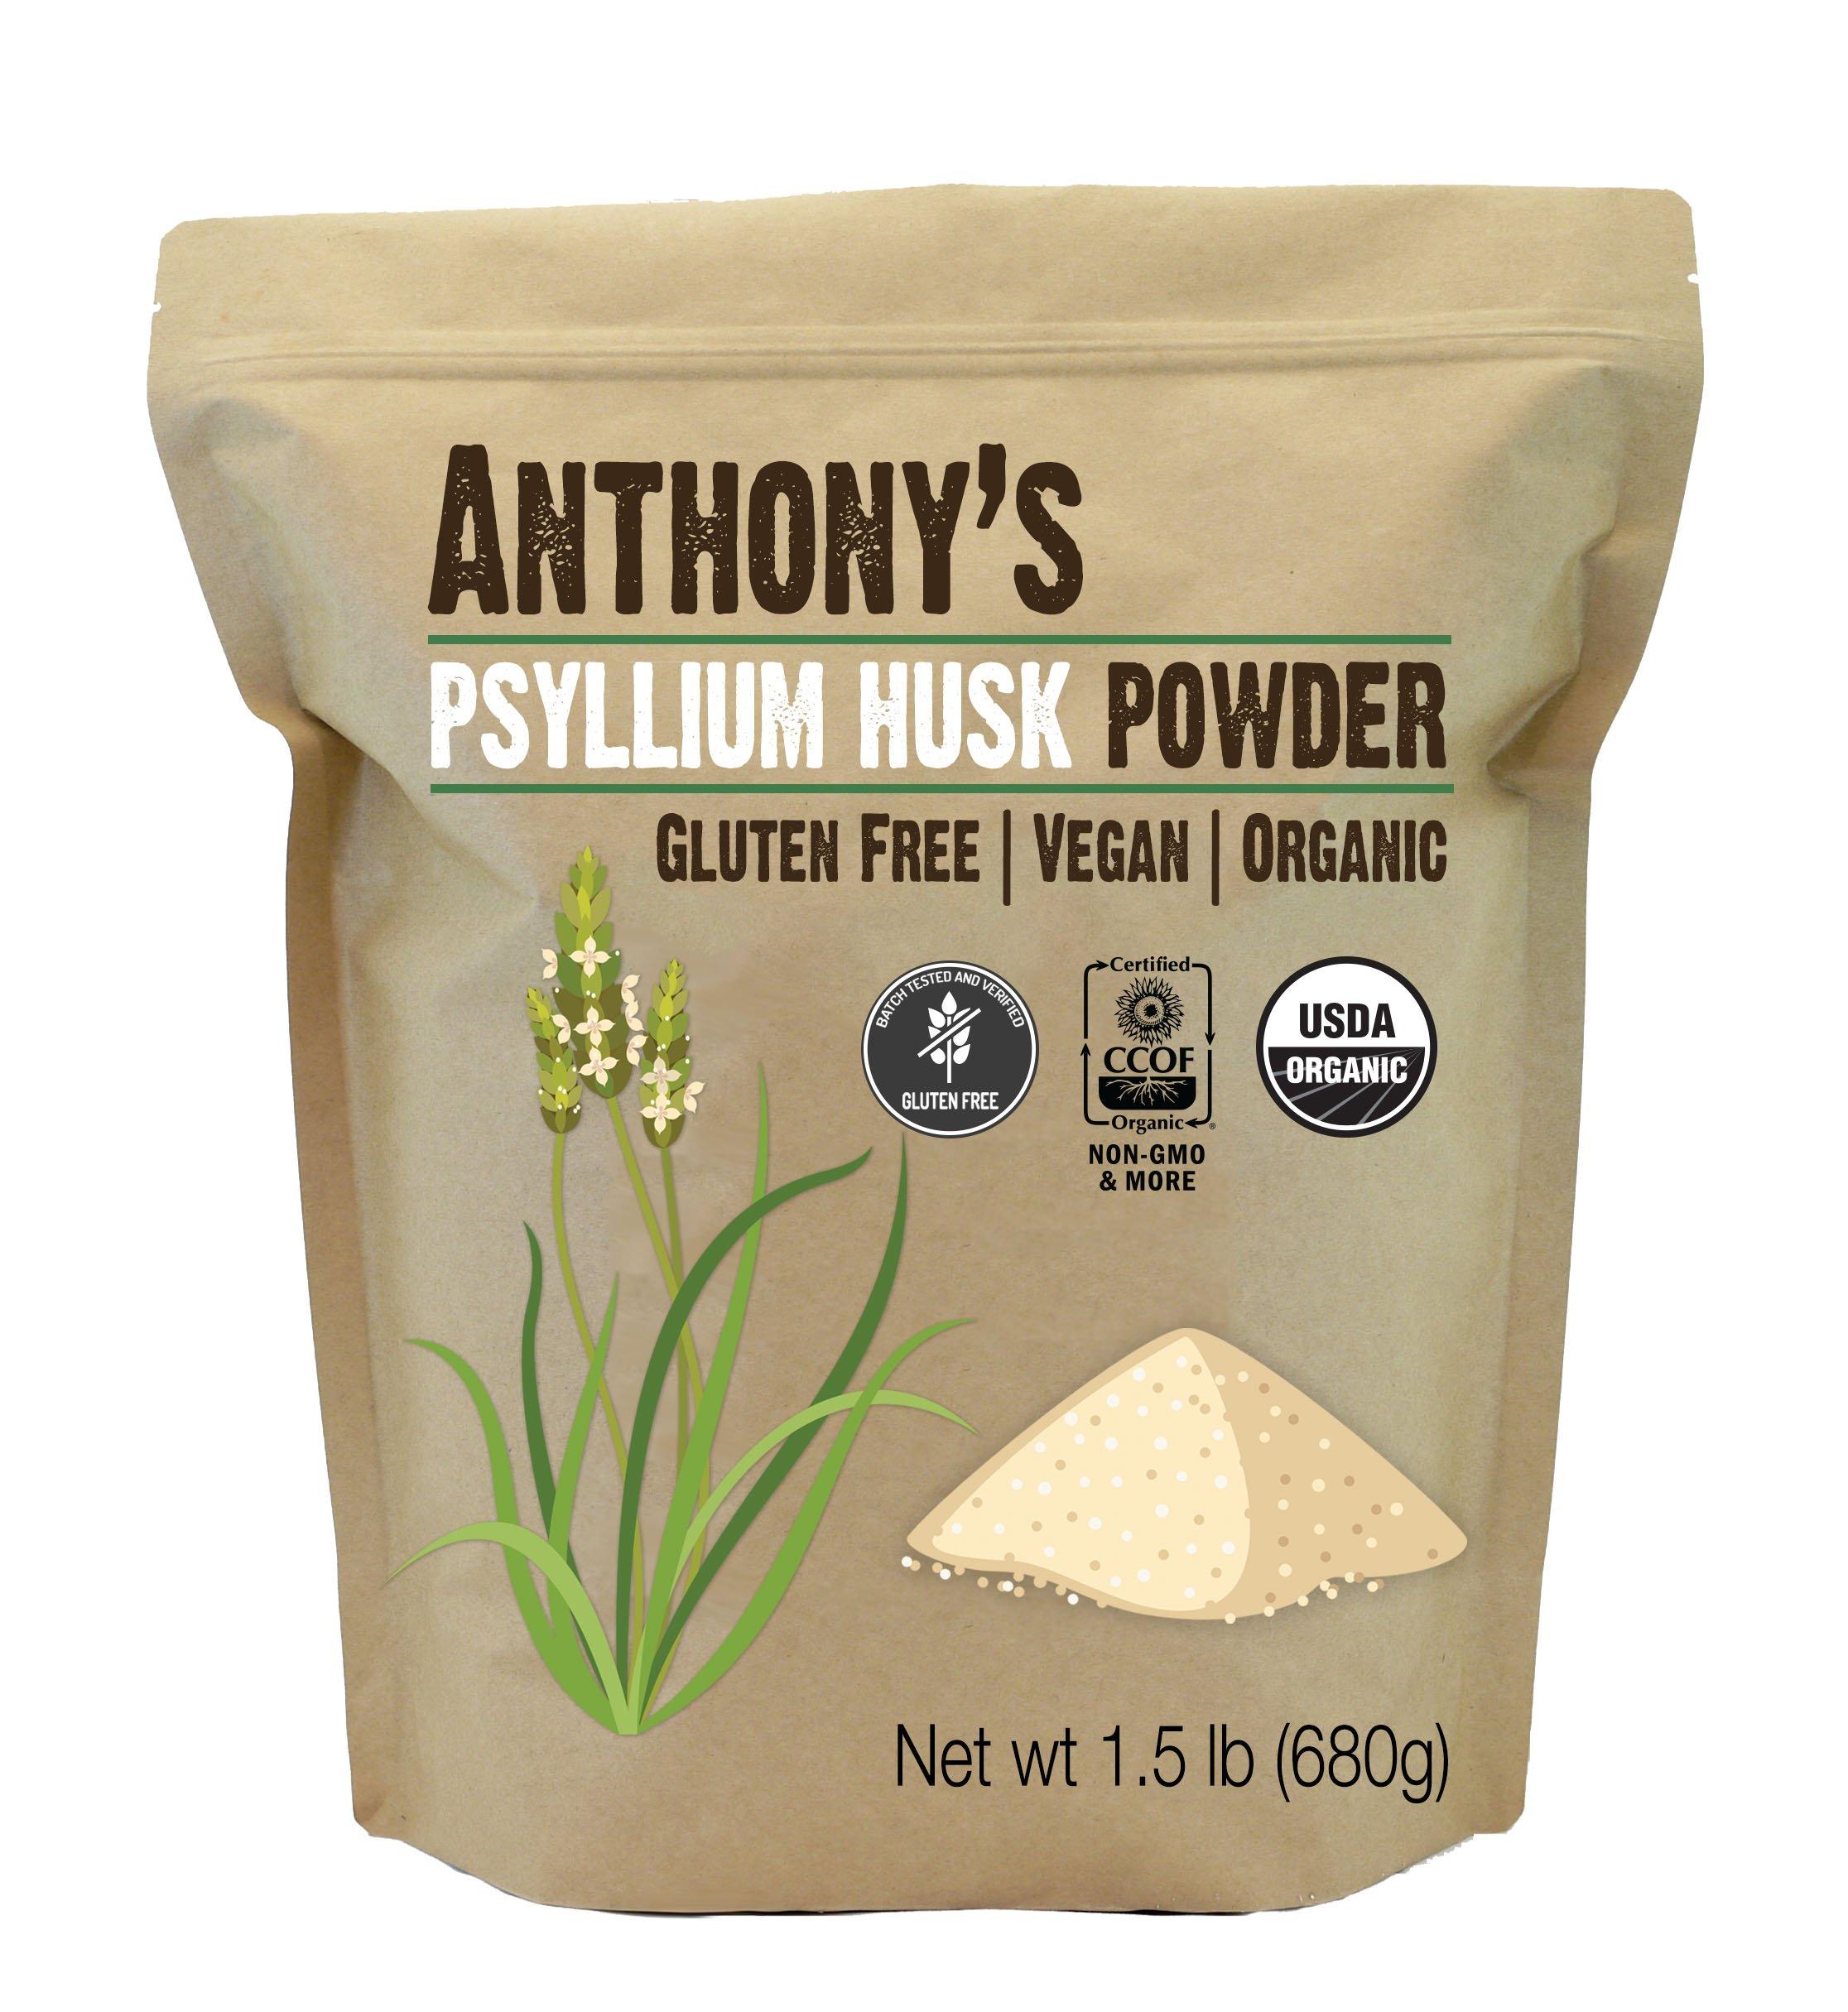 Anthony's Organic Psyllium Husk (1.5lb), Gluten Free, Non-GMO, (24 oz)